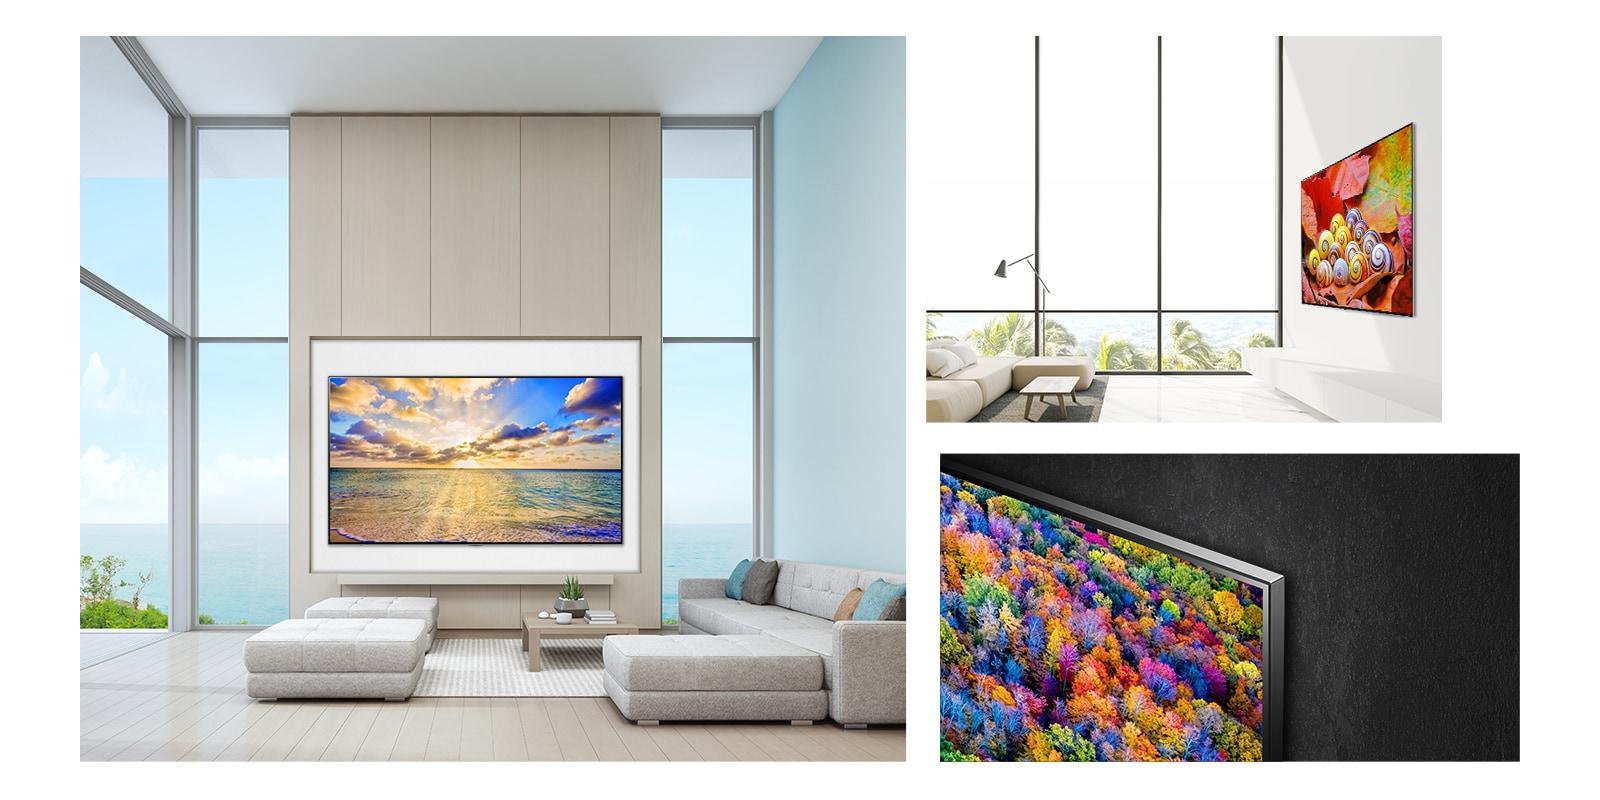 Gallery-design